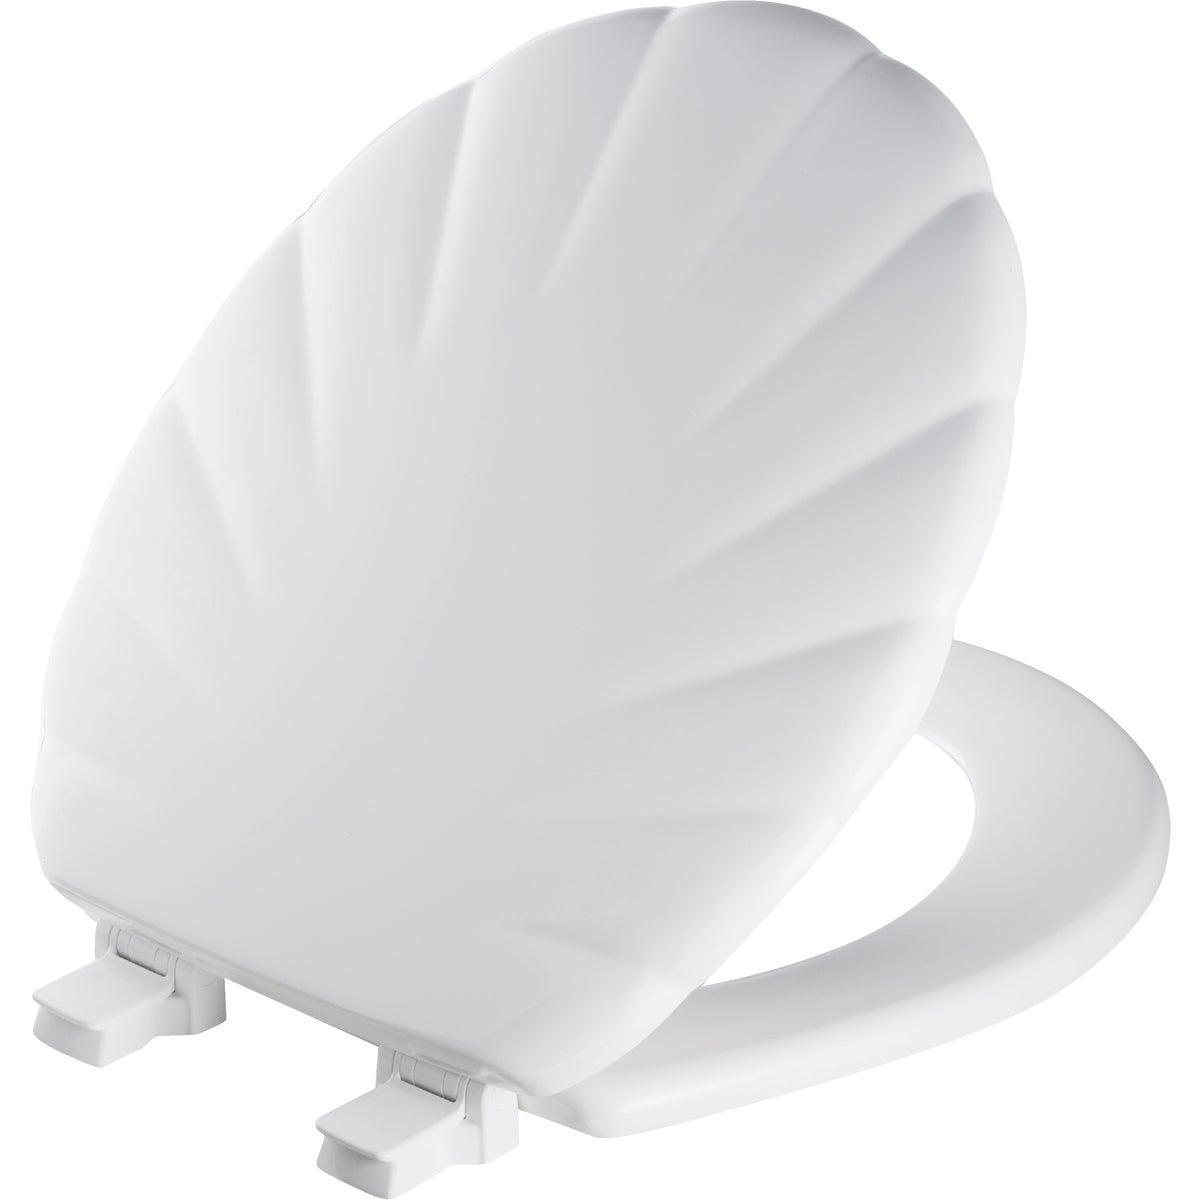 WHITE WOOD RND SHEL SEAT